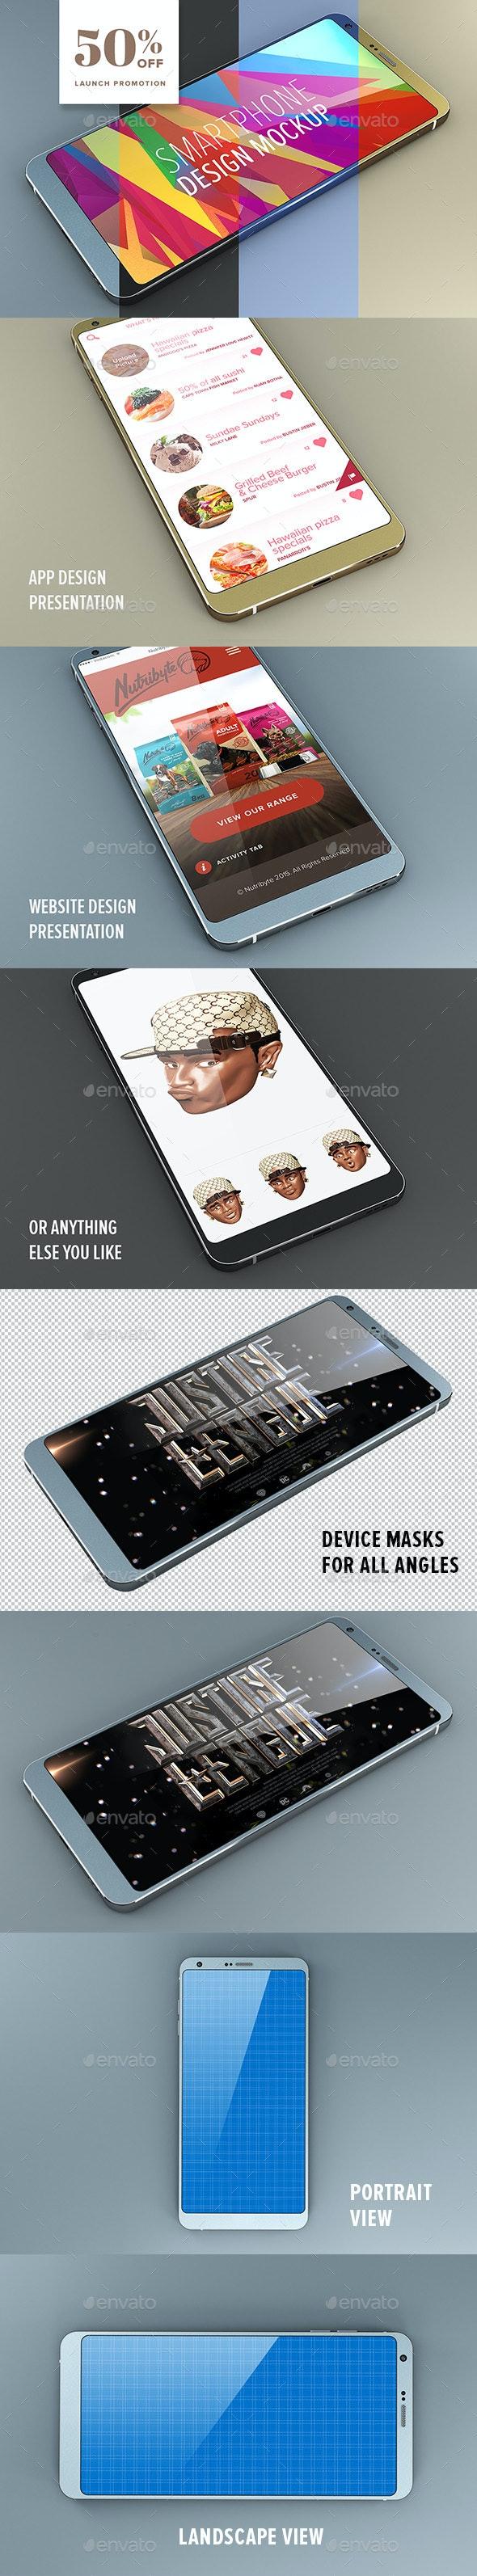 Android Smartphone Design Mockup - Mobile Displays